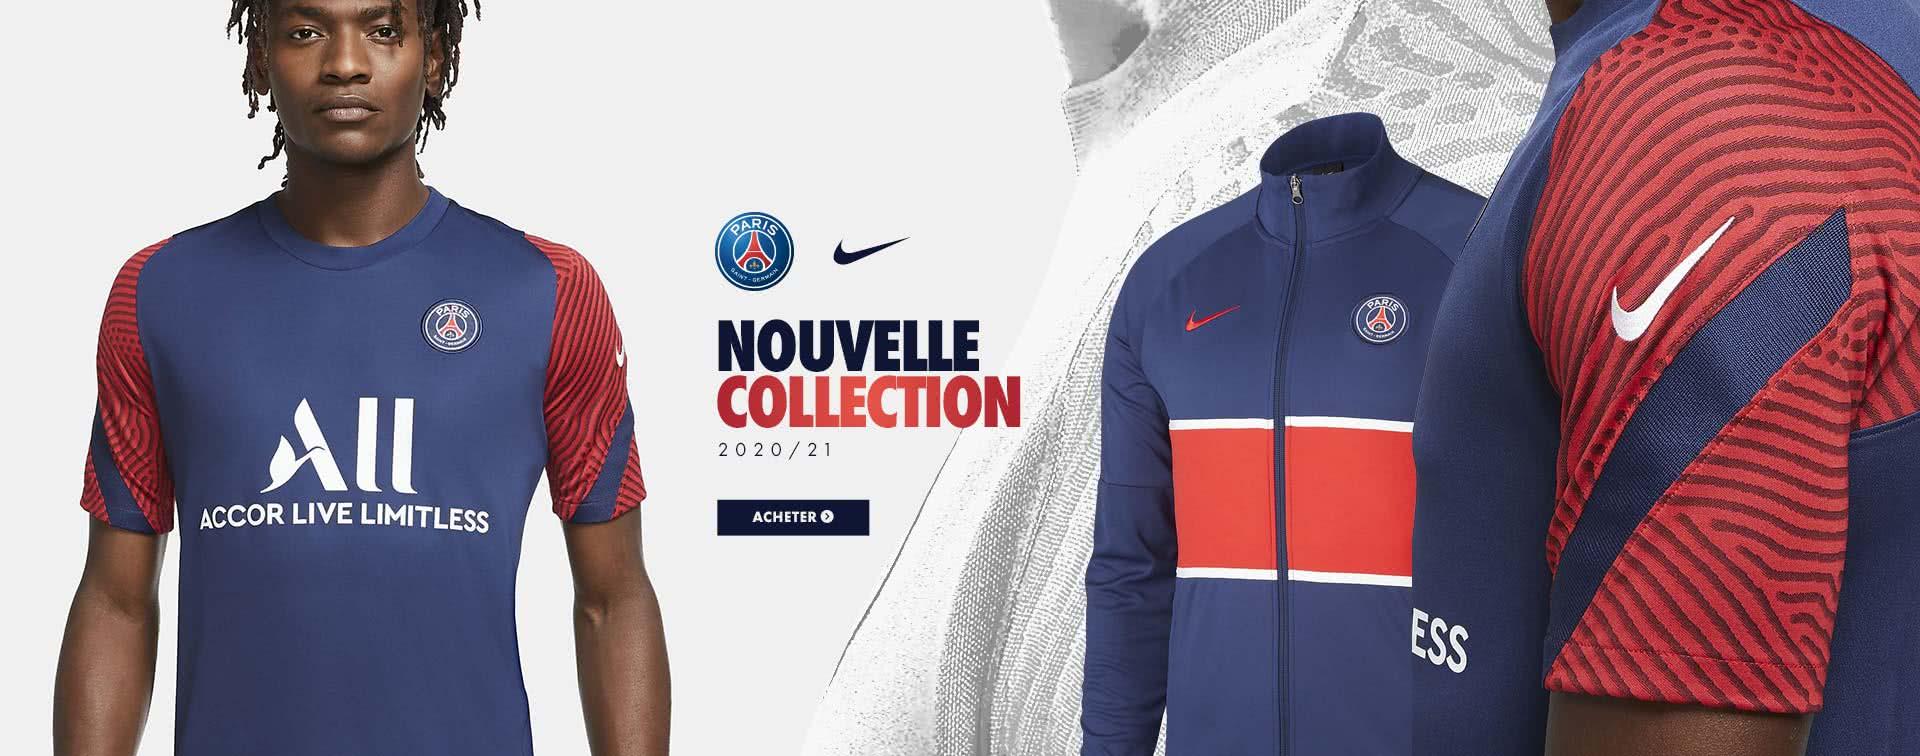 Nouvelle collection PSG 2020/2021